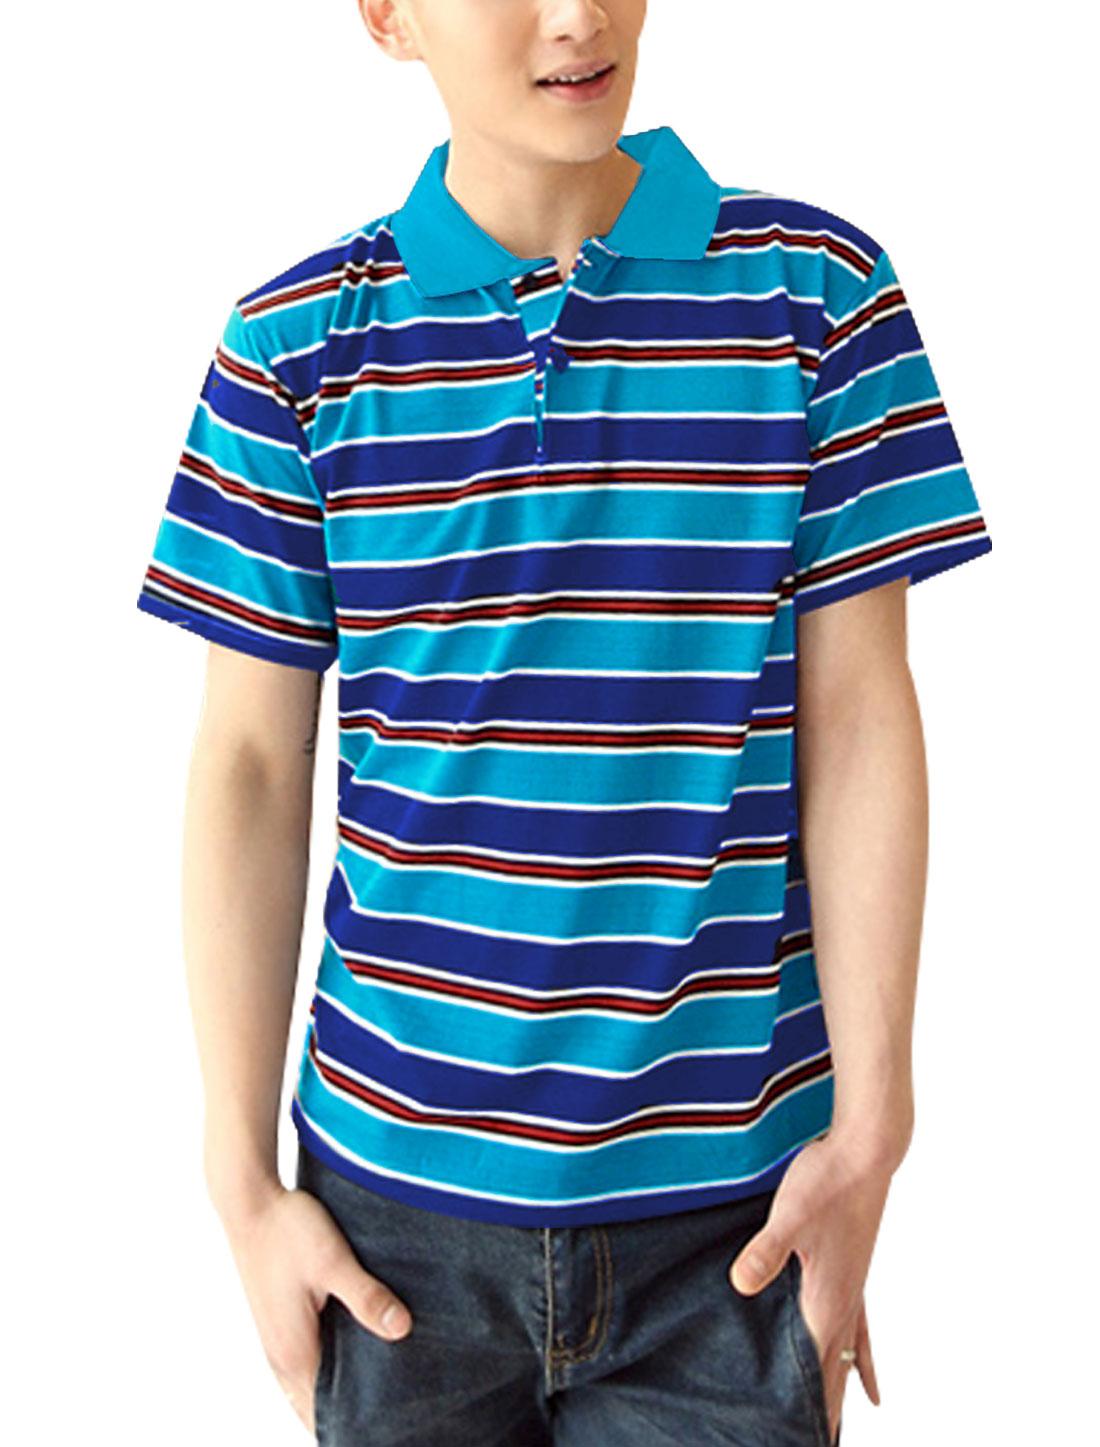 Men Stripes Pattern Rib Knit Detail Slim Fit Polo Shirt Navy Blue Light Blue M